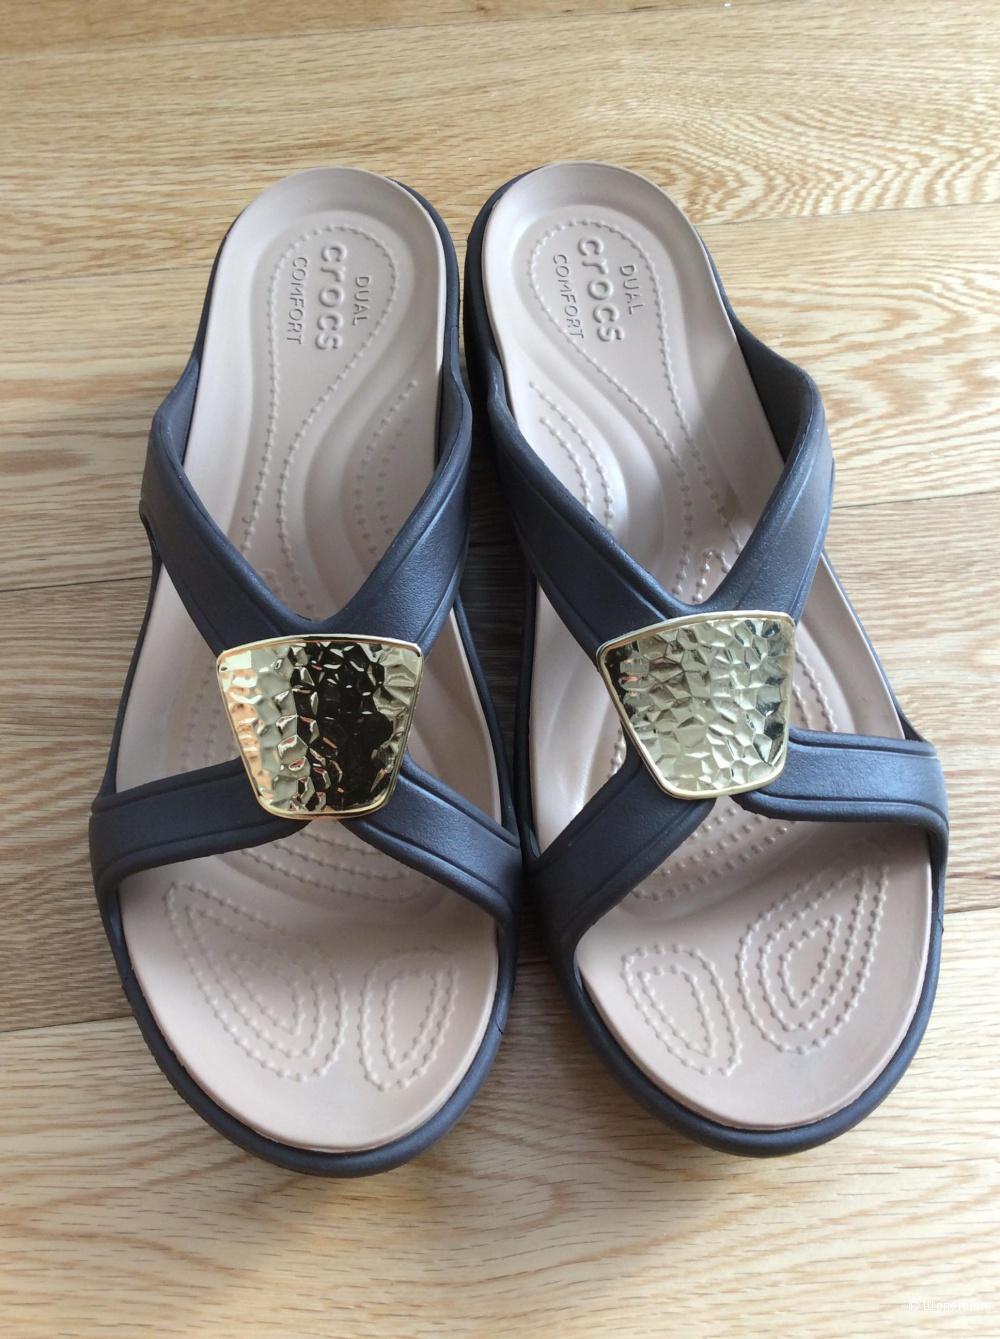 Пляжные шлёпанцы Crocs р.W9 (на стопу 25,5-26 см)